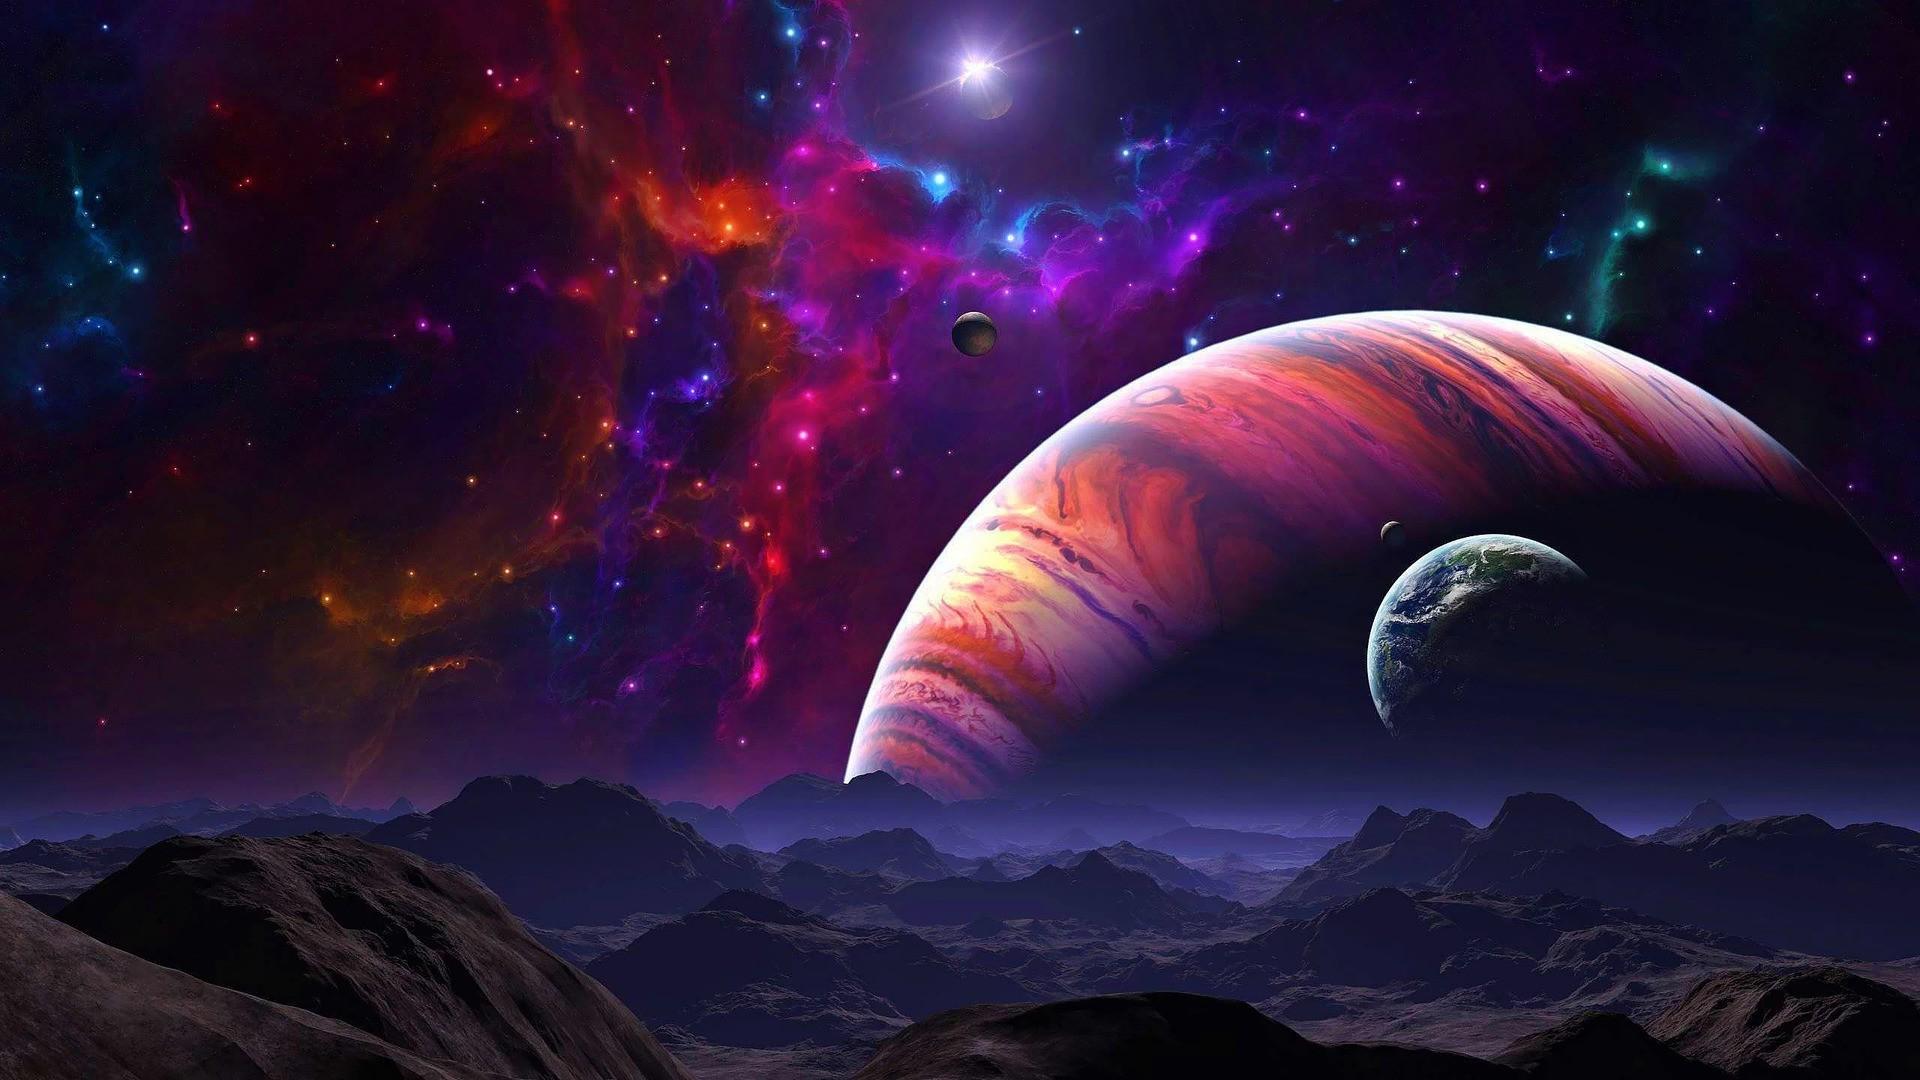 artwork, Fantasy Art, Concept Art, Sky, Galaxy, Space, Digital Art  Wallpapers HD / Desktop and Mobile Backgrounds